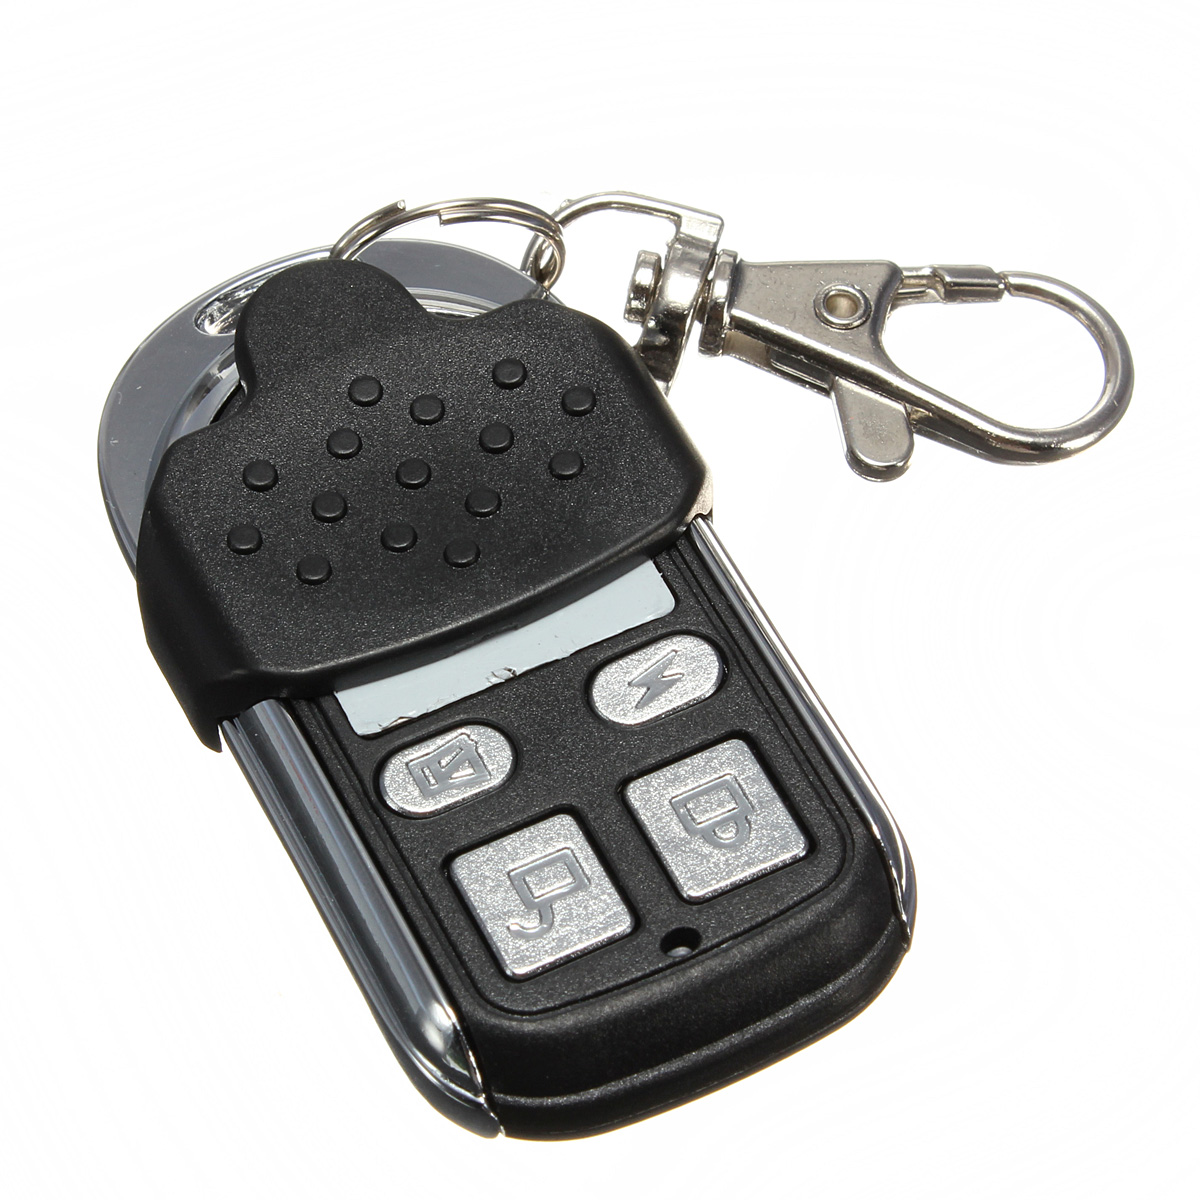 Button eca garage gate remote key control opener operator